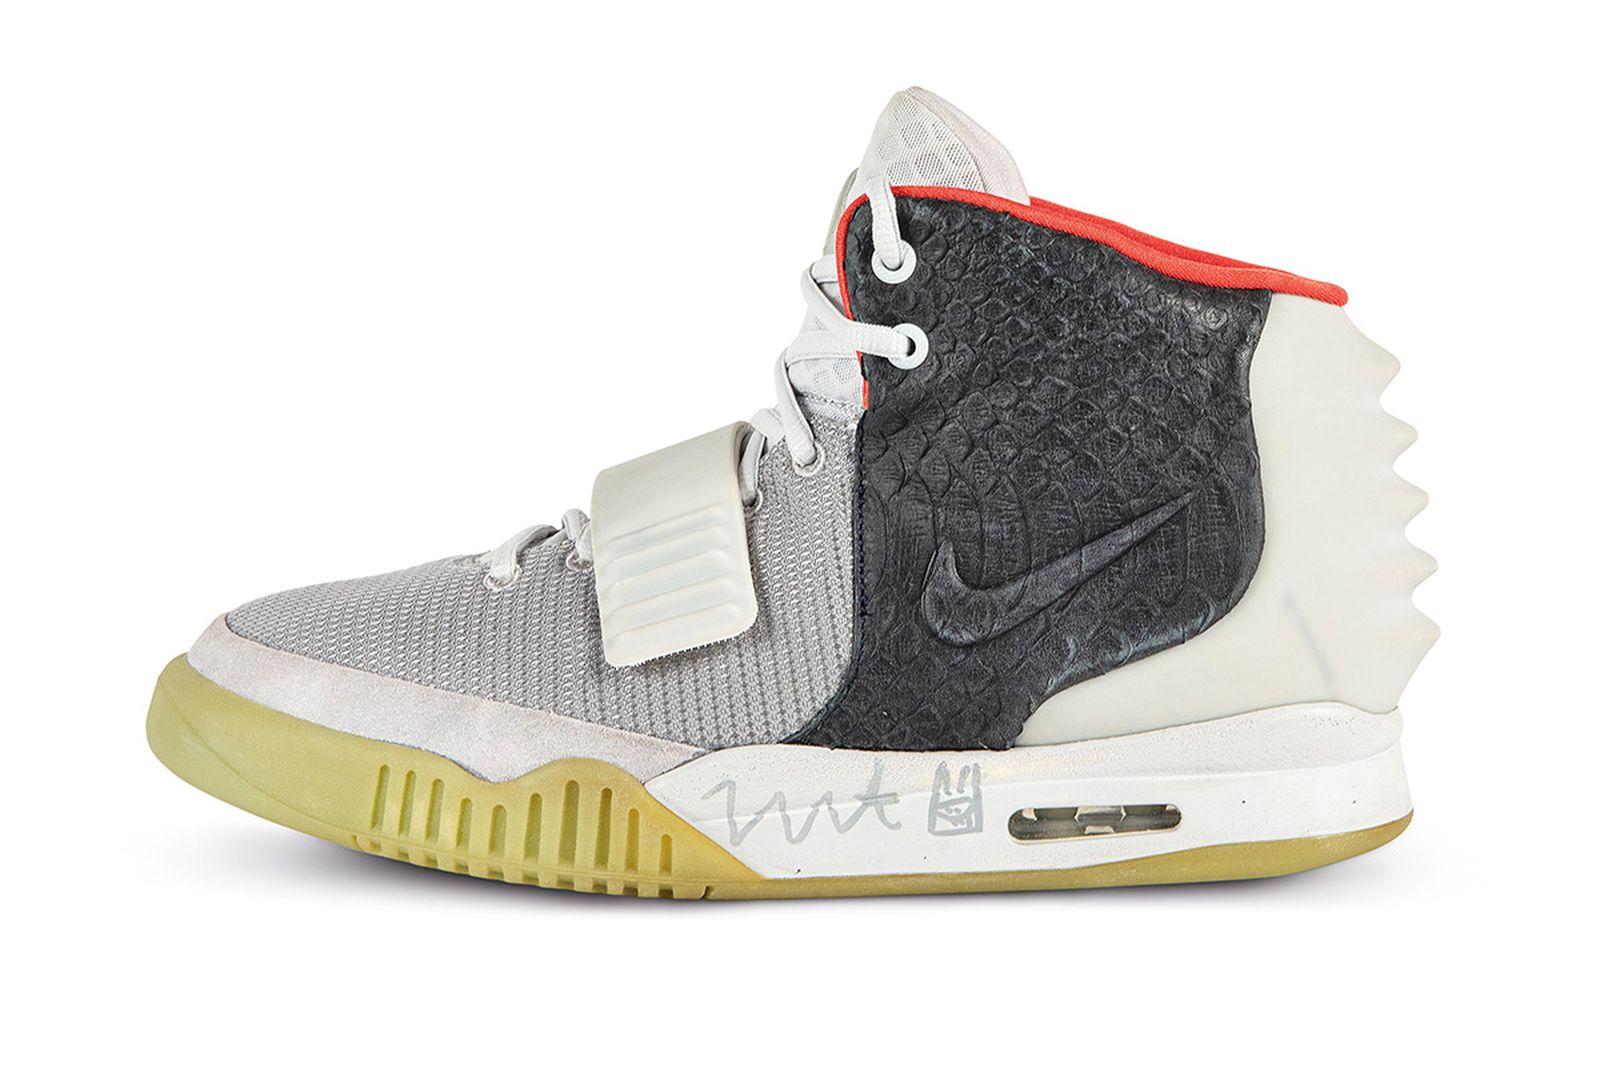 sothebys-rare-nike-sneaker-auction-11